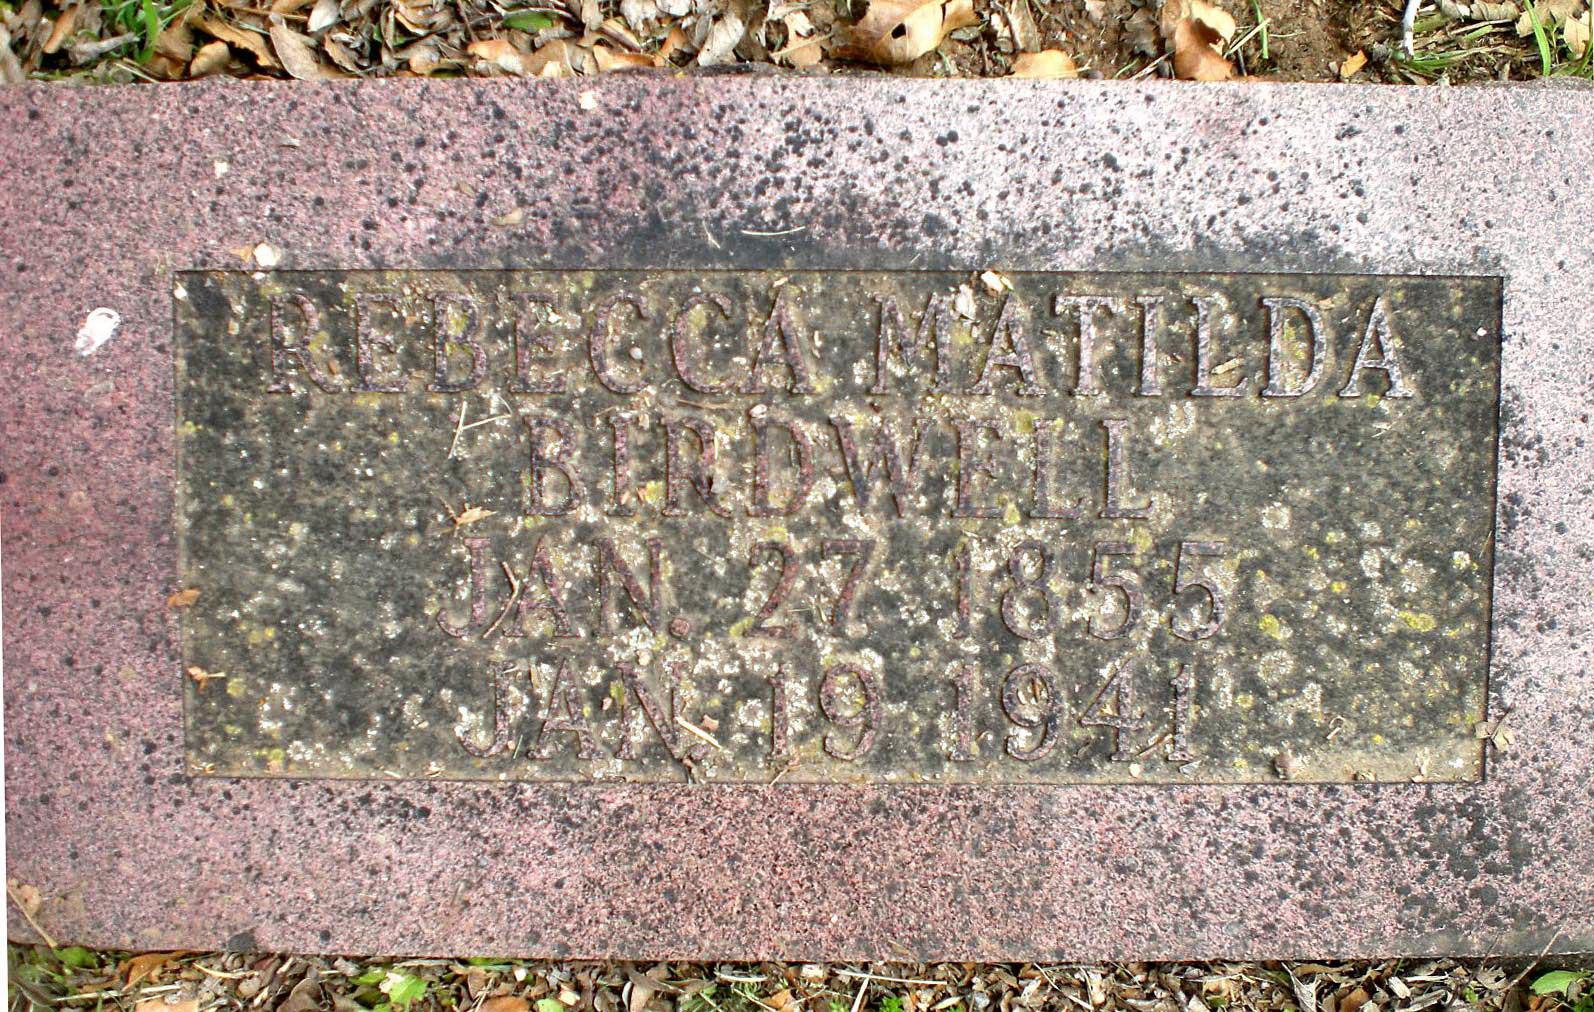 James E Stinecipher